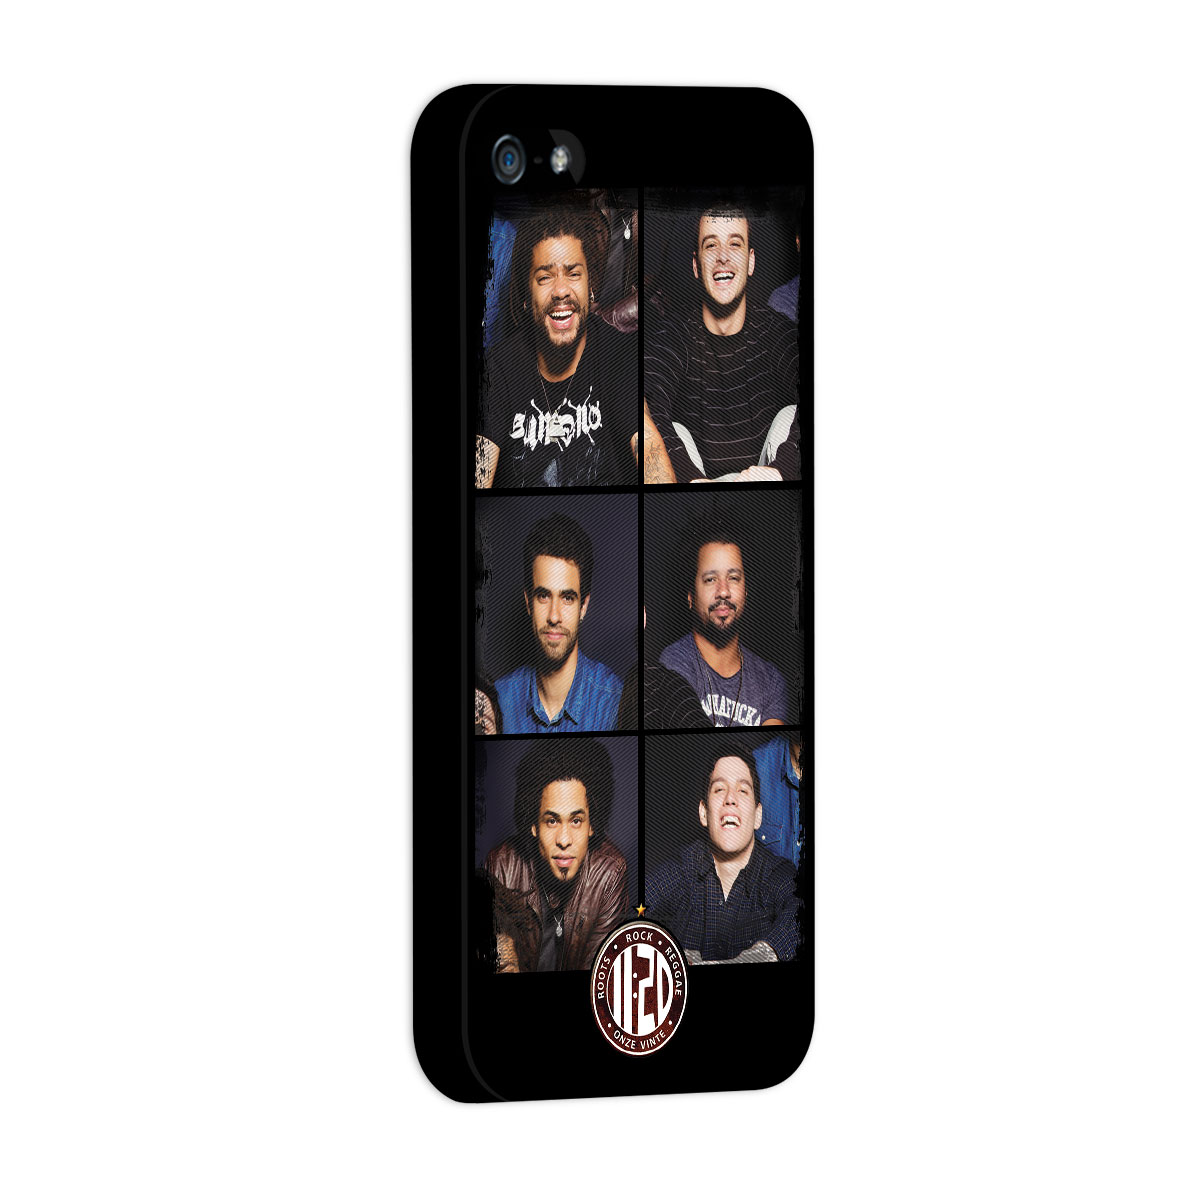 Capa de iPhone 5/5S Onze:20 Faces